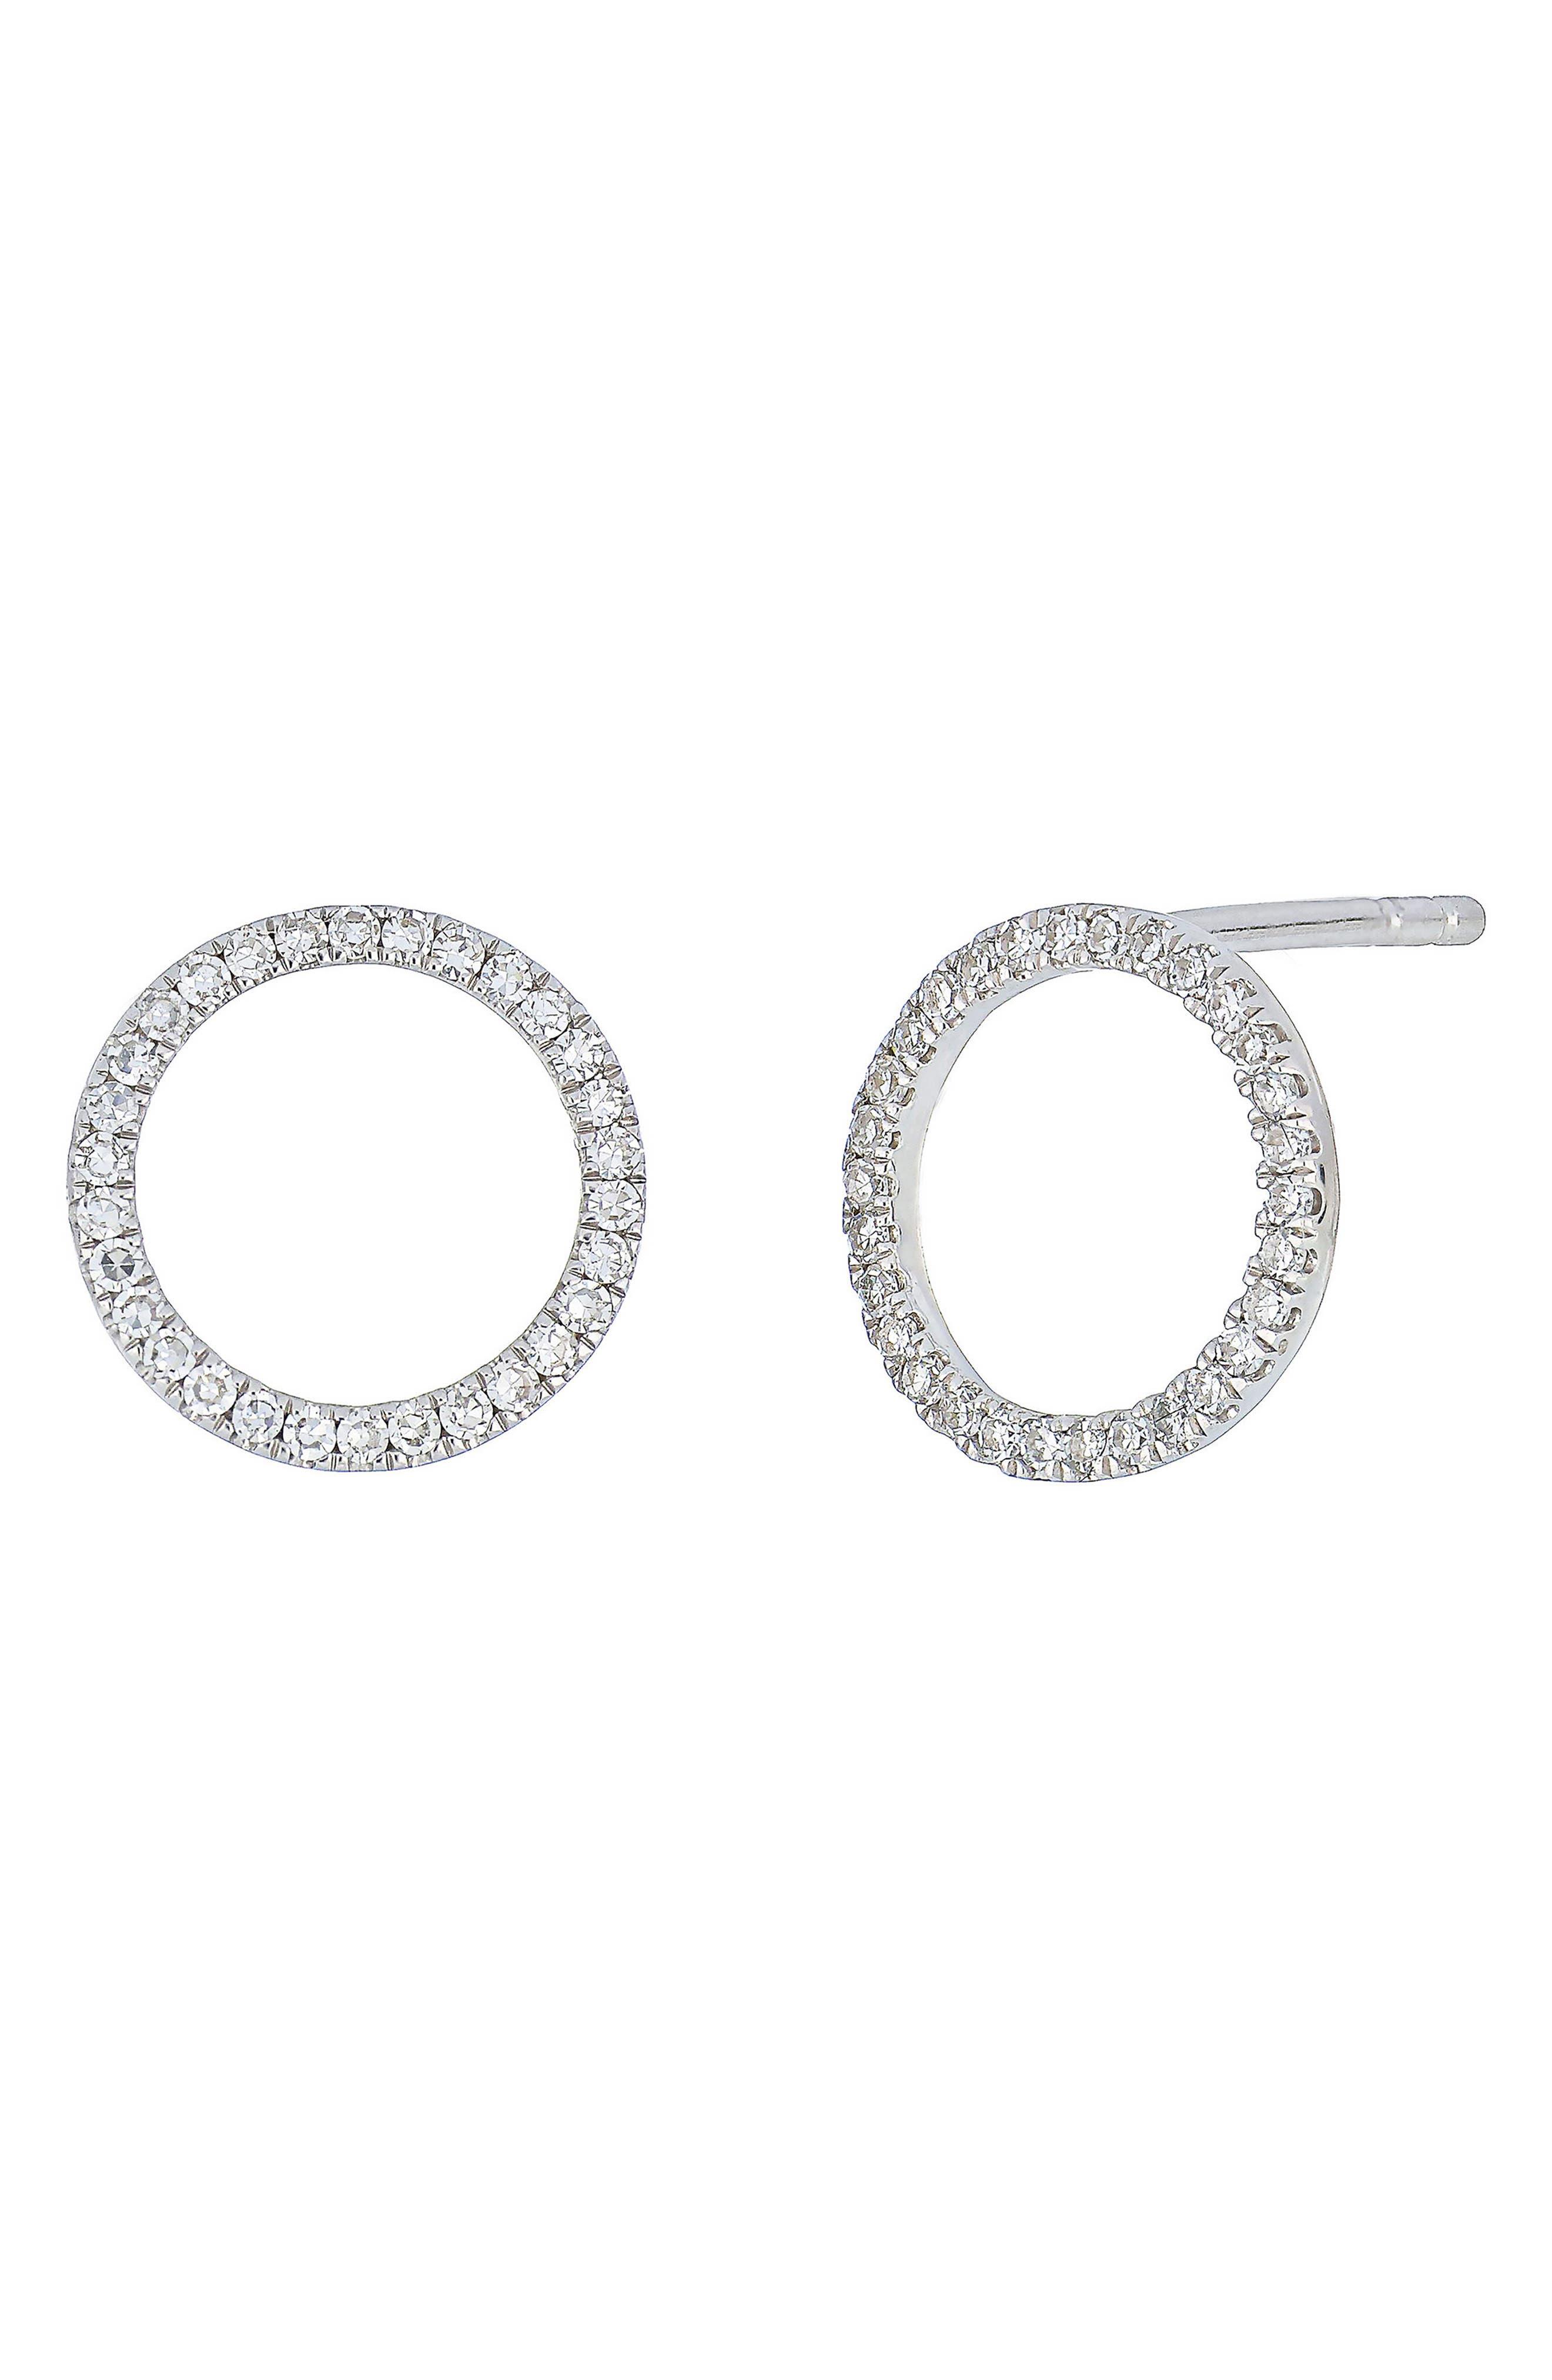 Carrière Diamond Circle Earrings,                             Main thumbnail 1, color,                             Silver/ Diamond